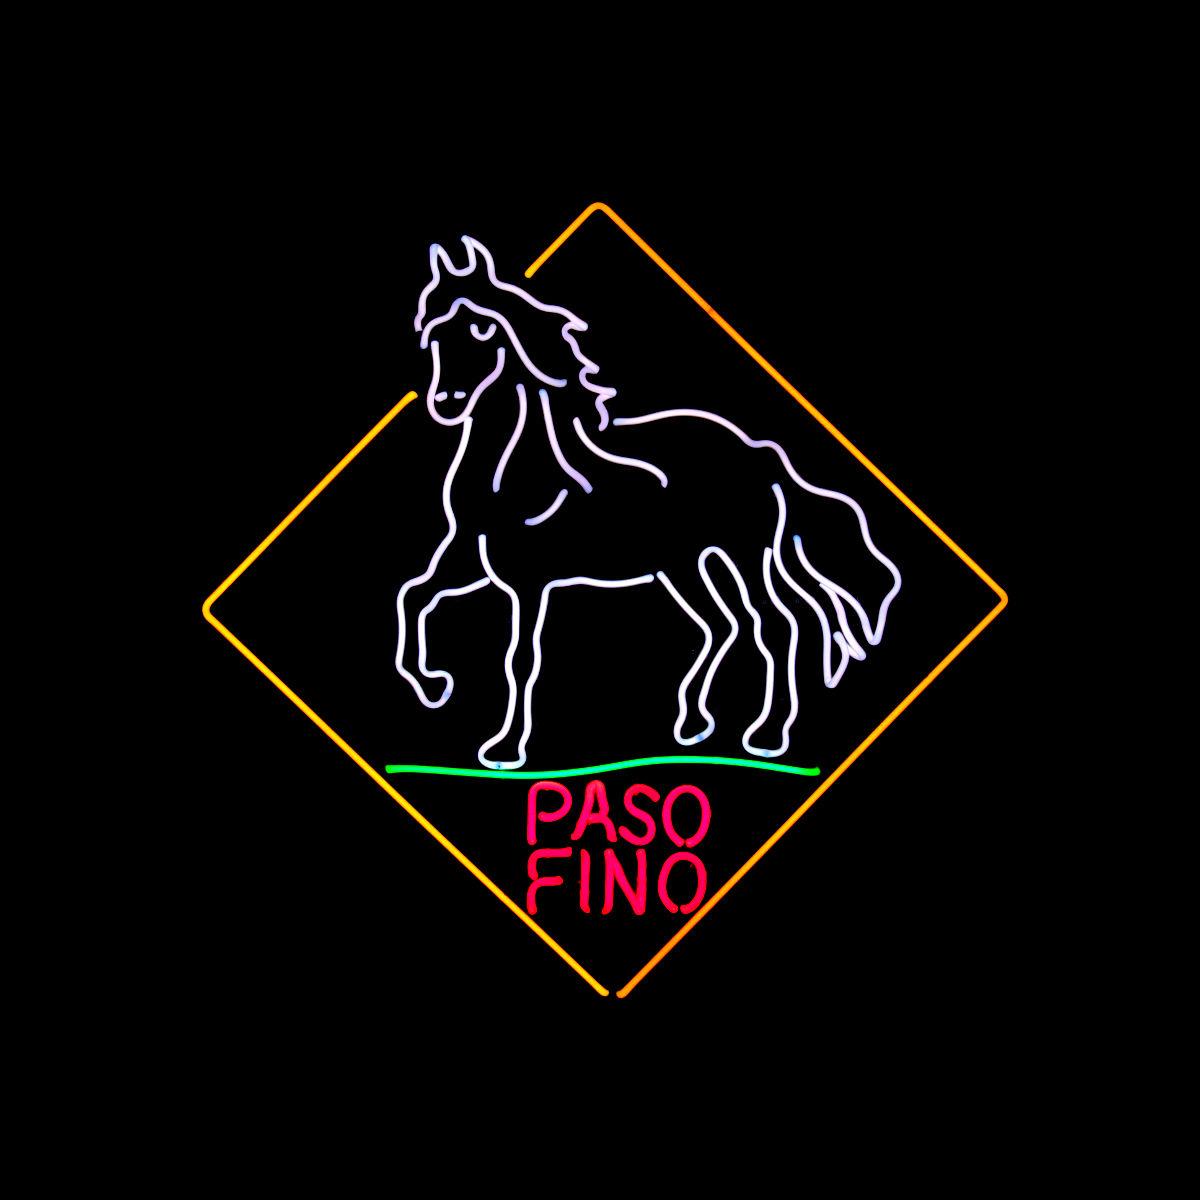 PASO FINO HORSE NEON SCULPTURE.jpg